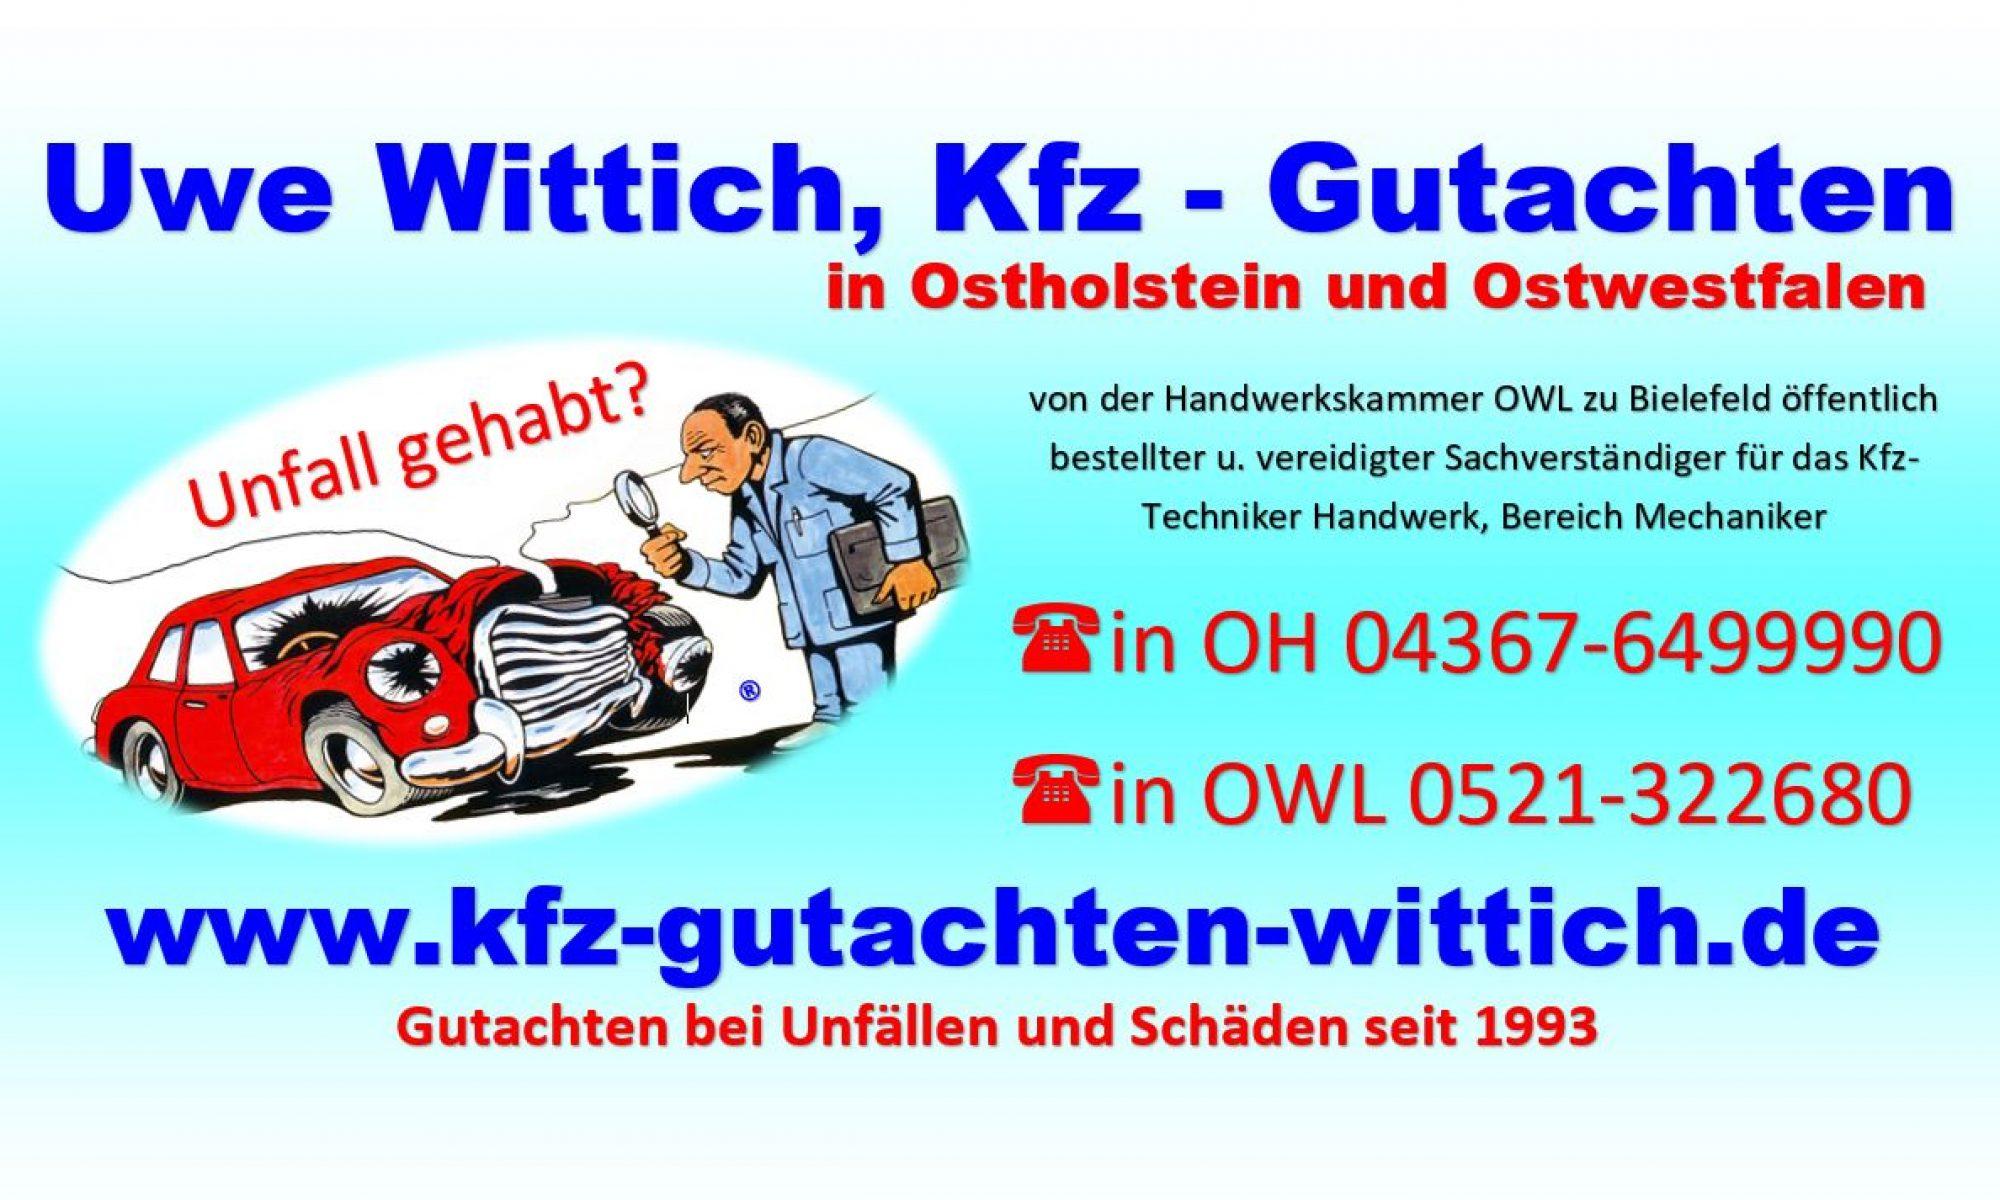 Kfz Gutachten Ostholstein